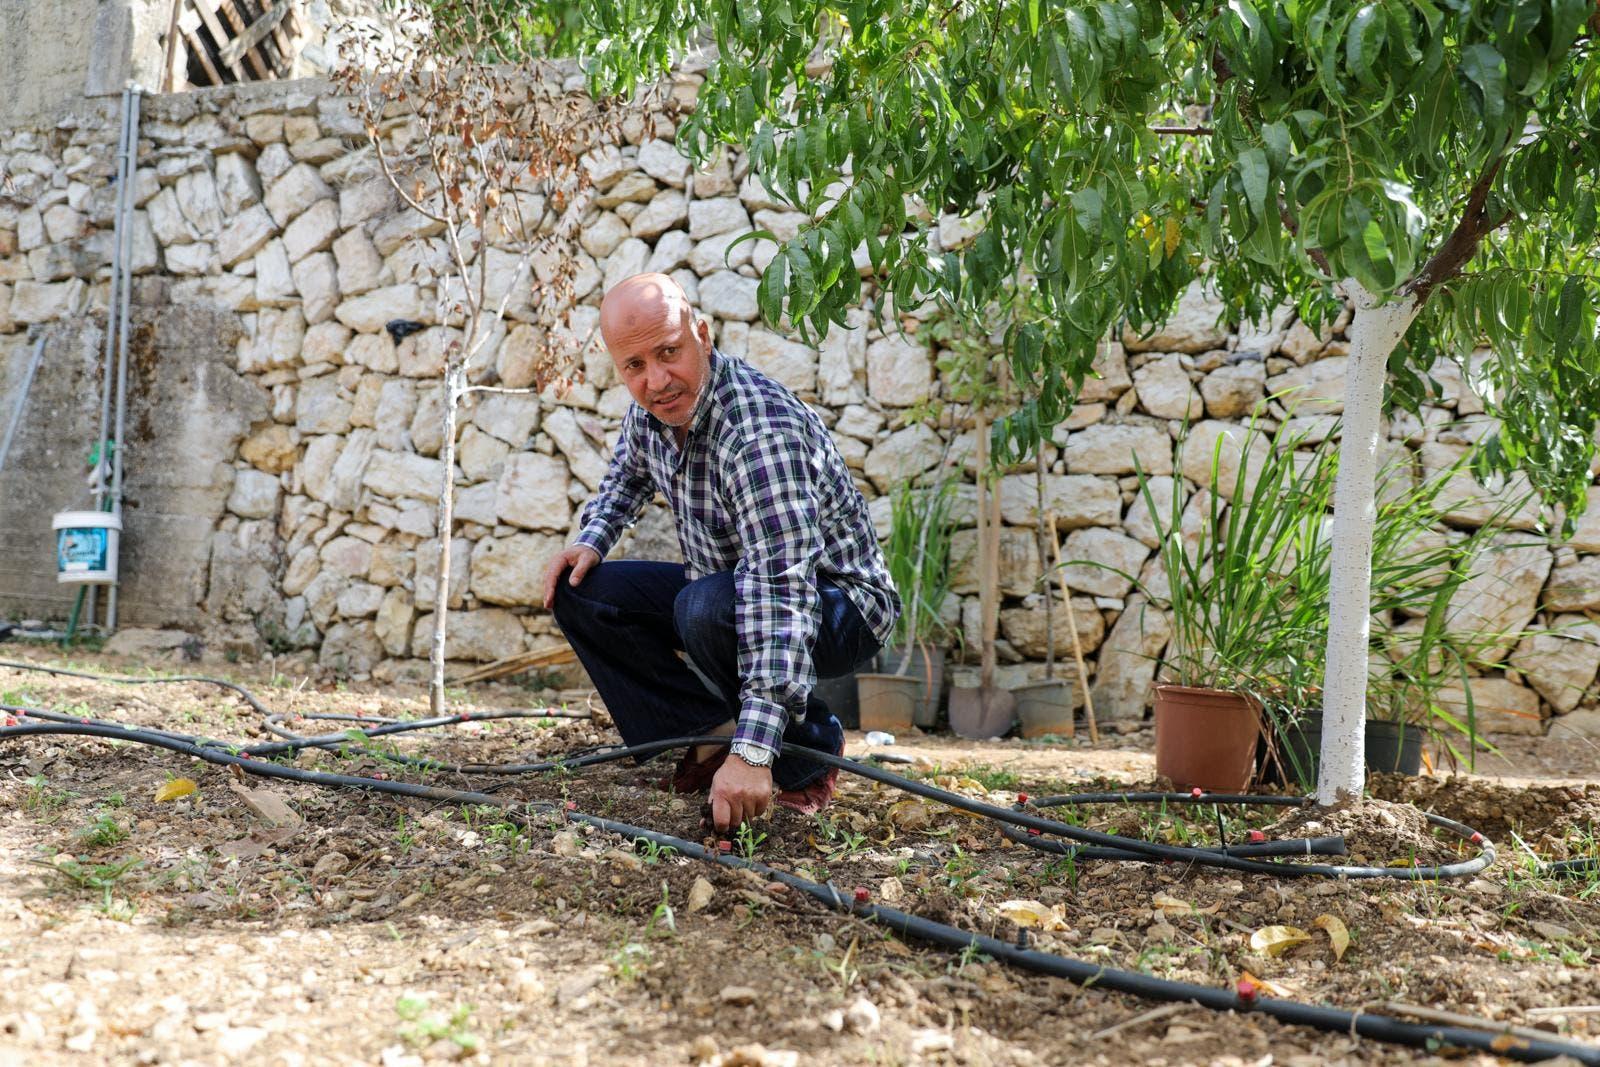 Abdul Salam Mohammad al-Mughrabi points to his irrigation system used to water his pumpkins. (Moe Shamseddine)